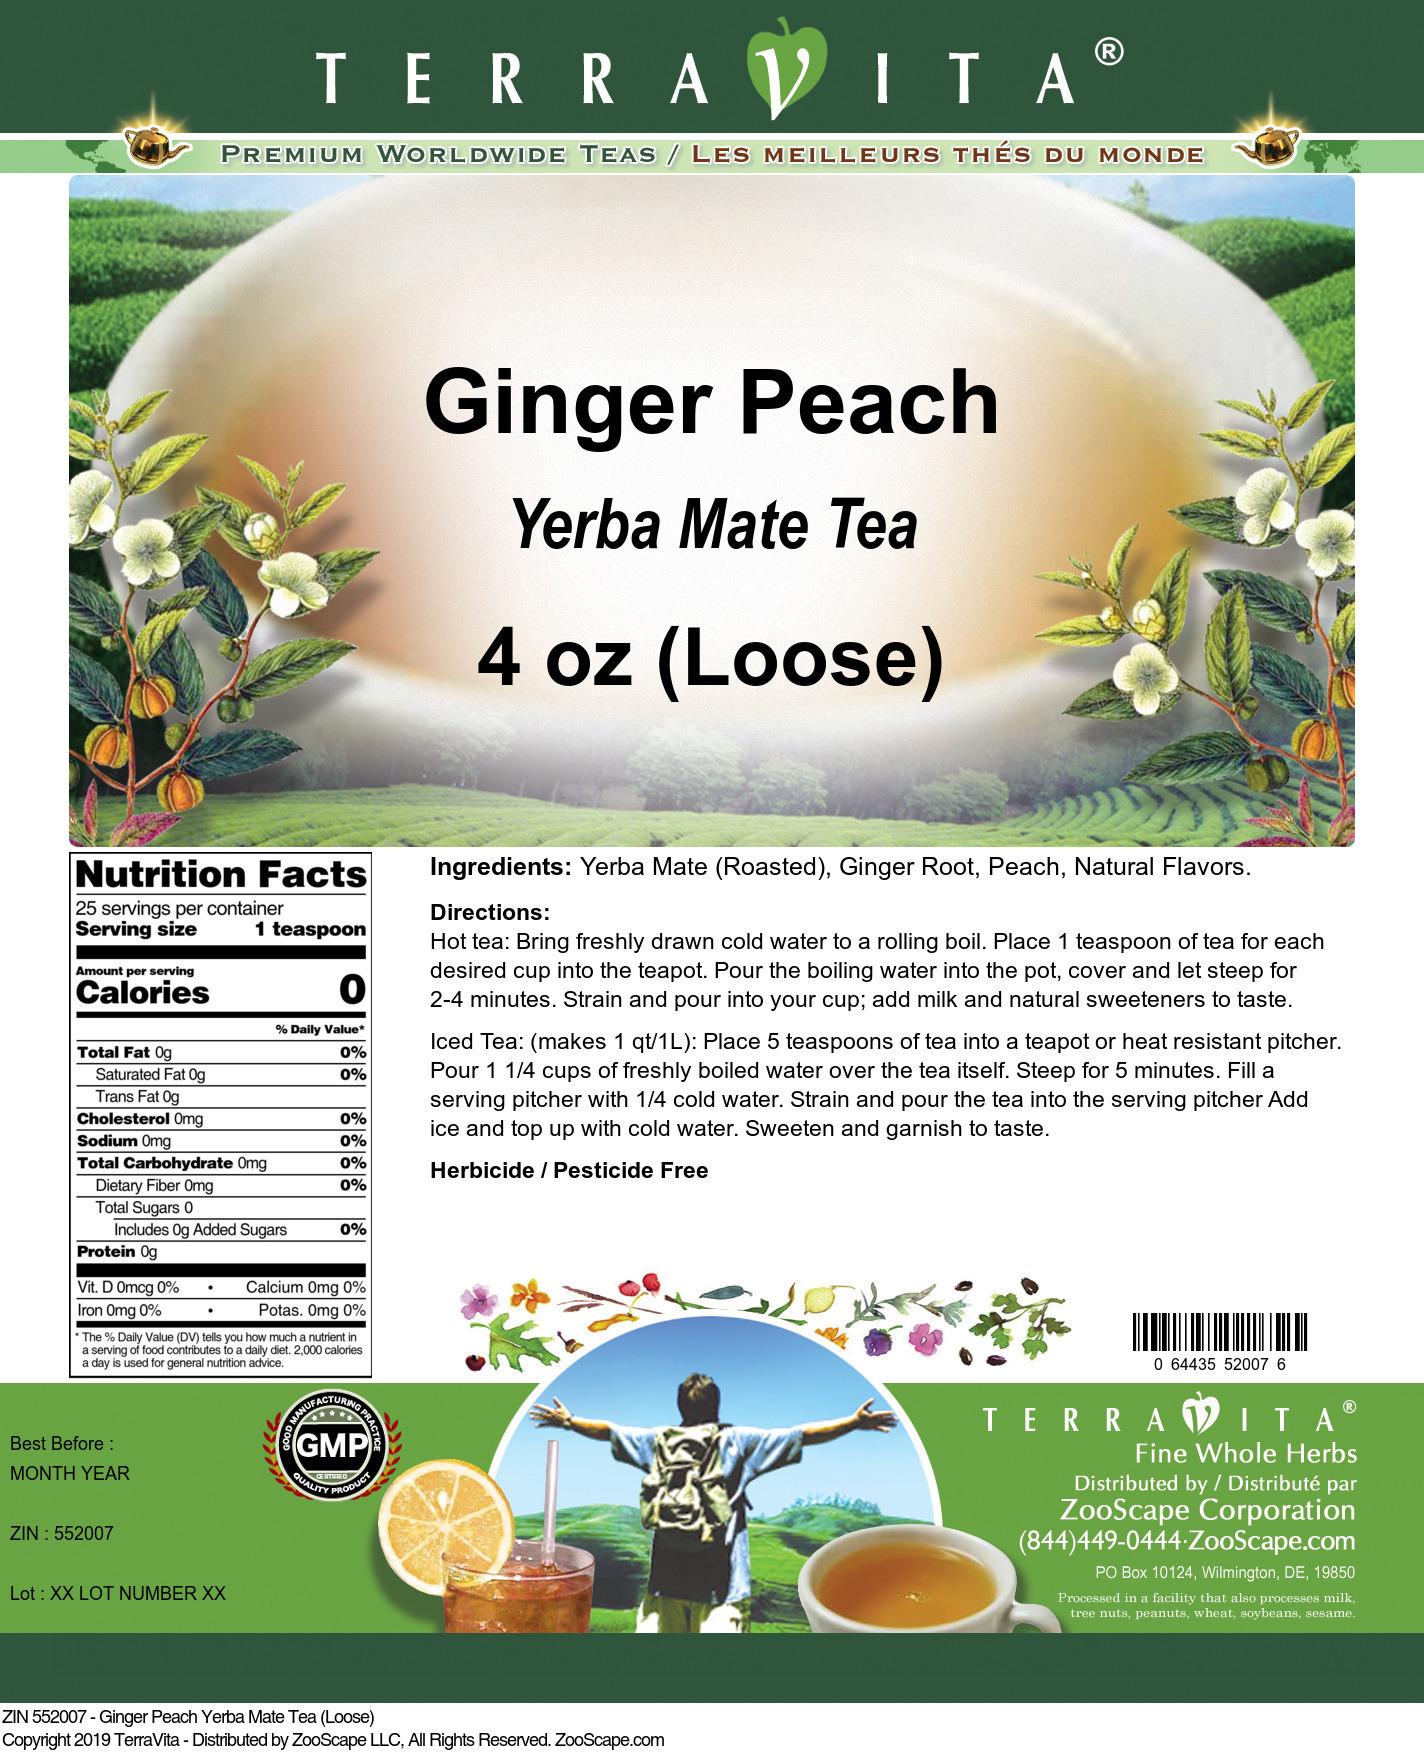 Ginger Peach Yerba Mate Tea (Loose)